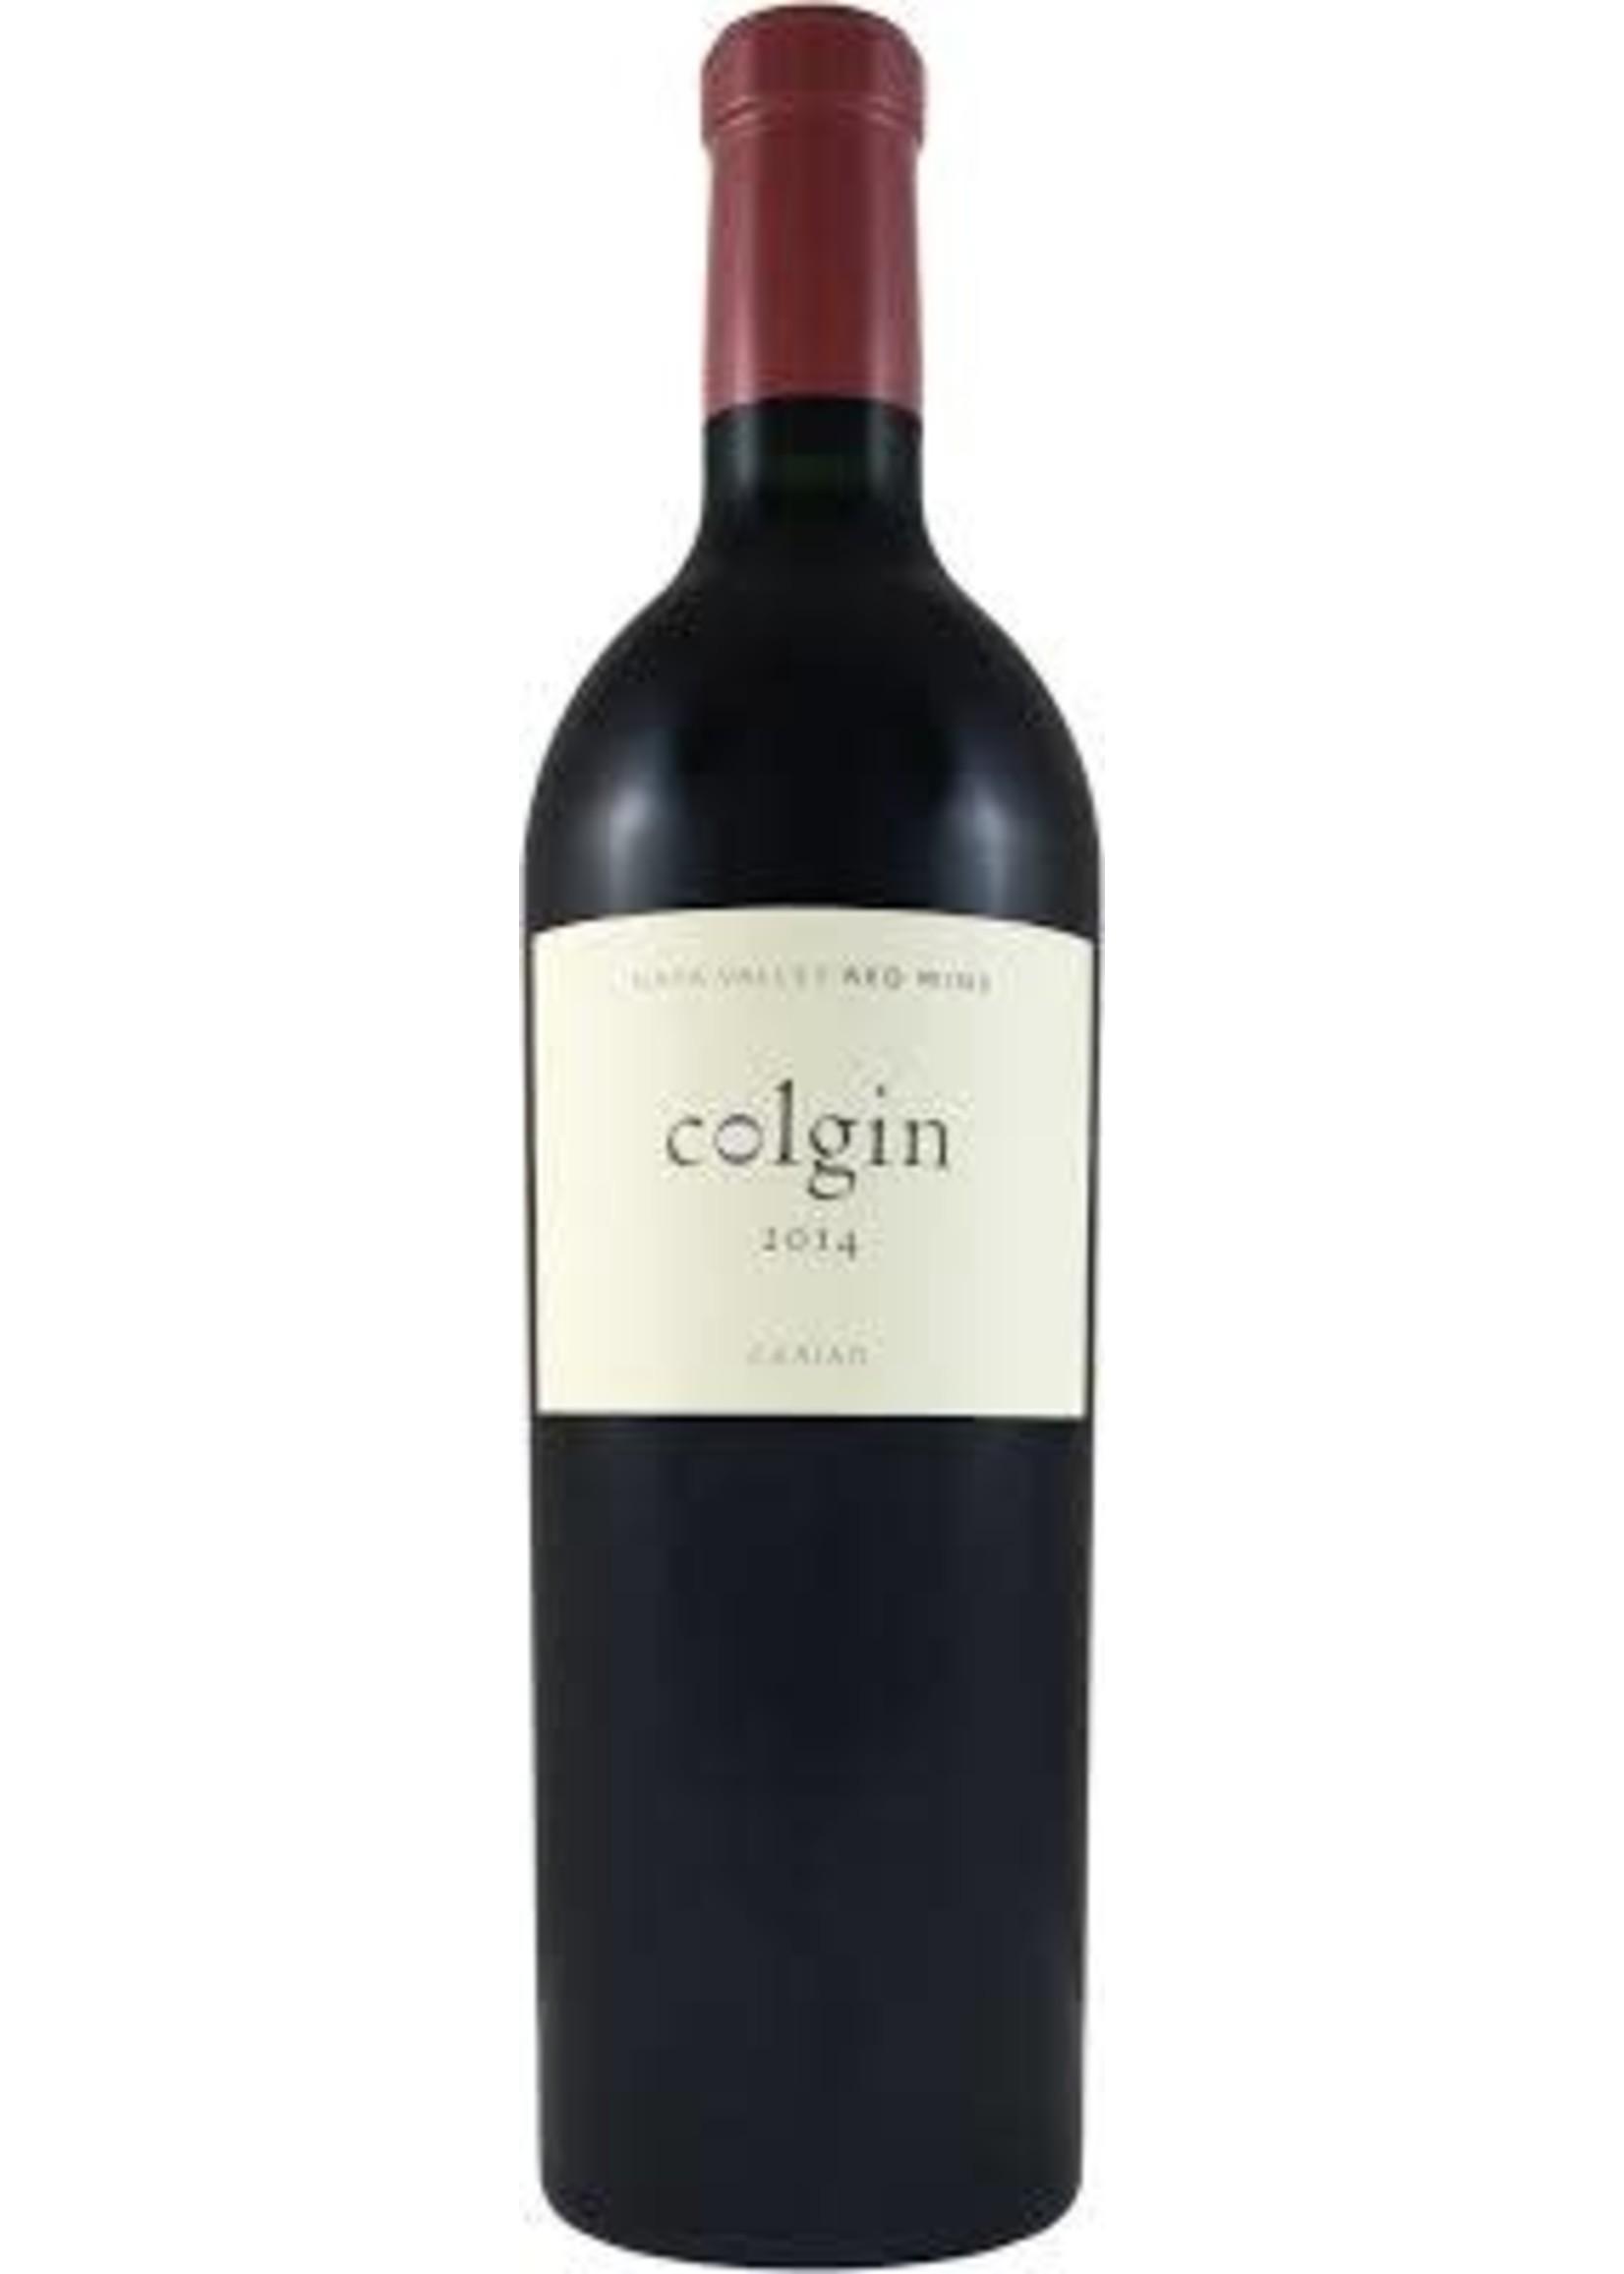 Colgin 2014 Cariad Red 750ml